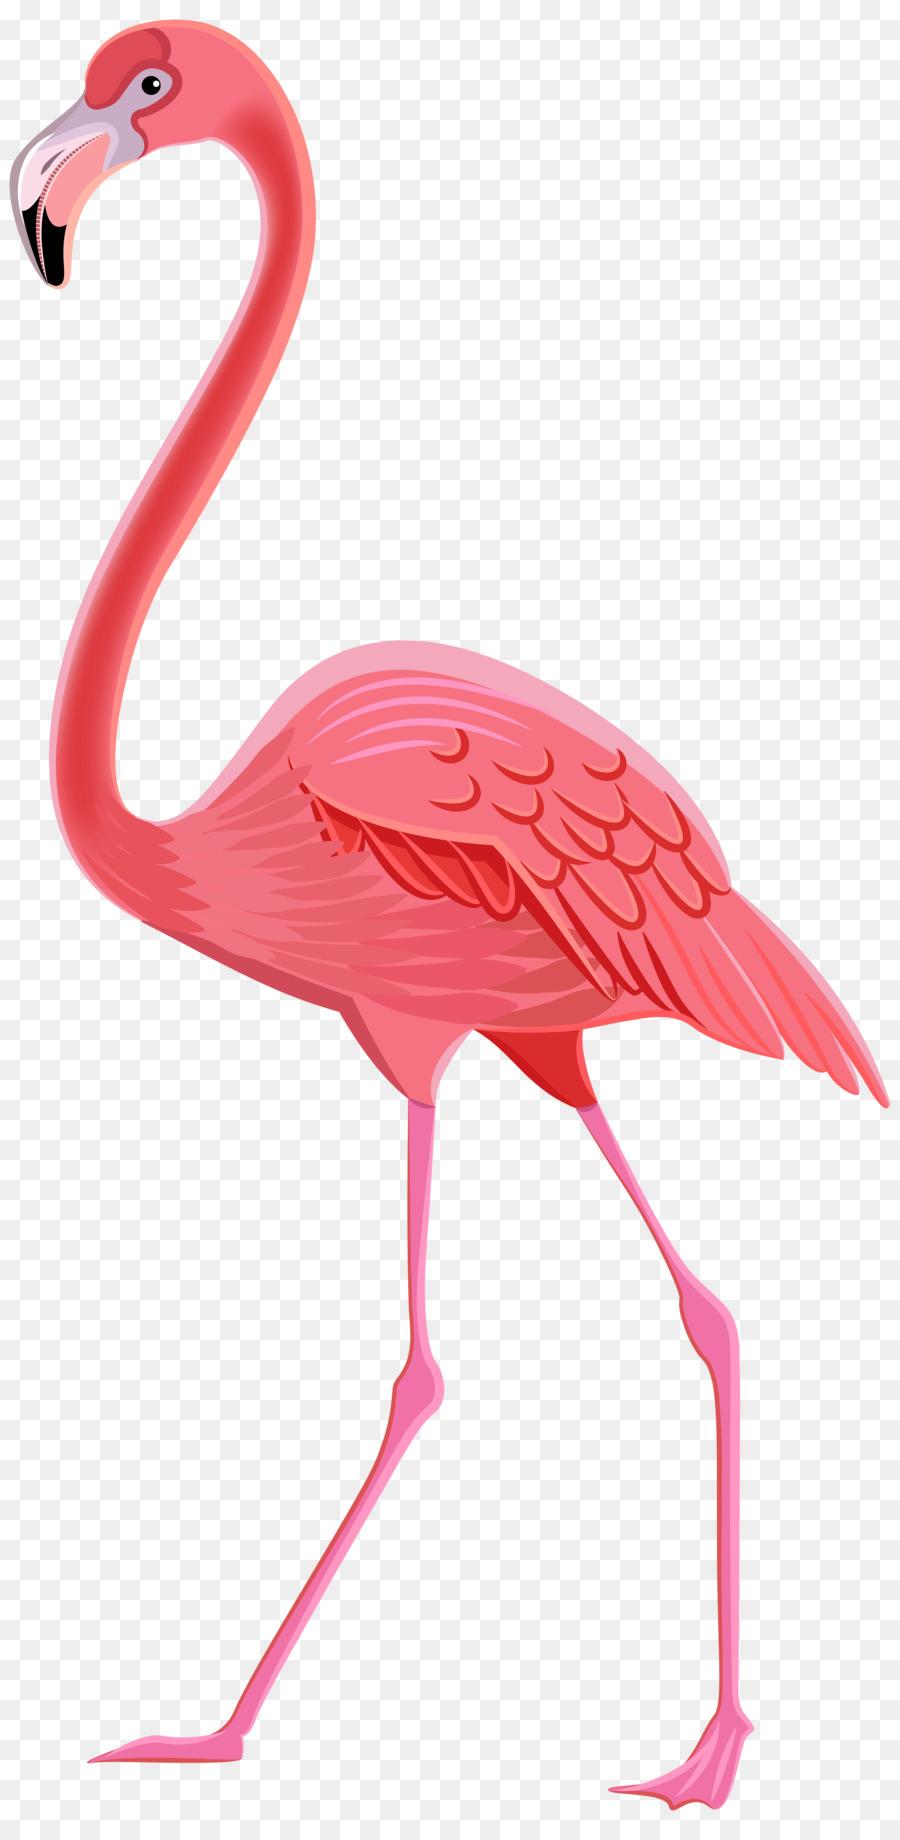 Pink Flamingo Png Download - 39358000 - Free Transparent -4575